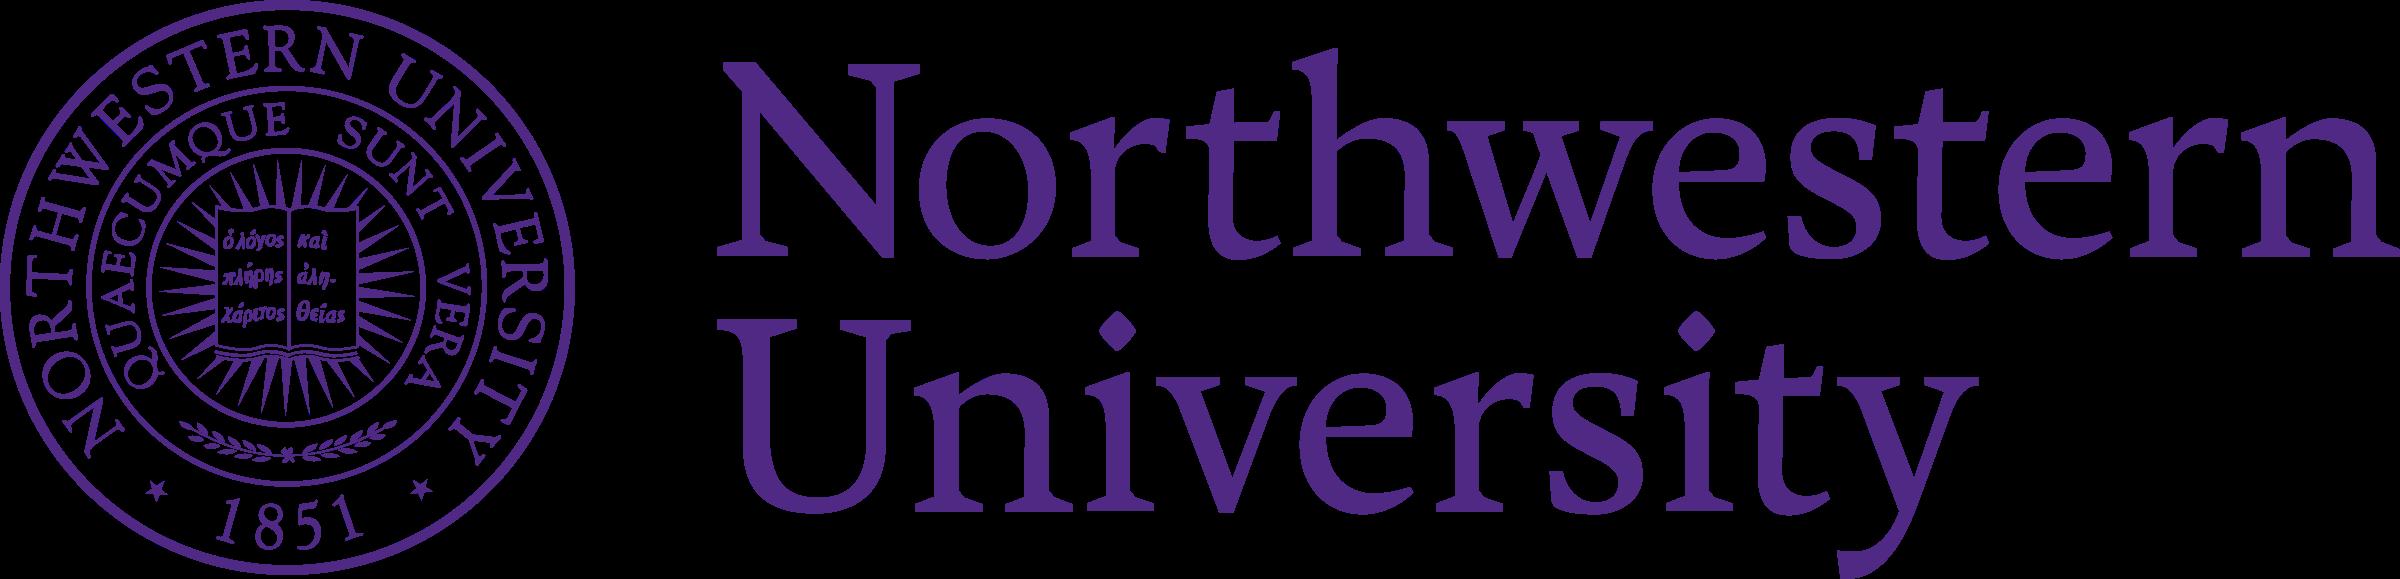 Northwestern University.png